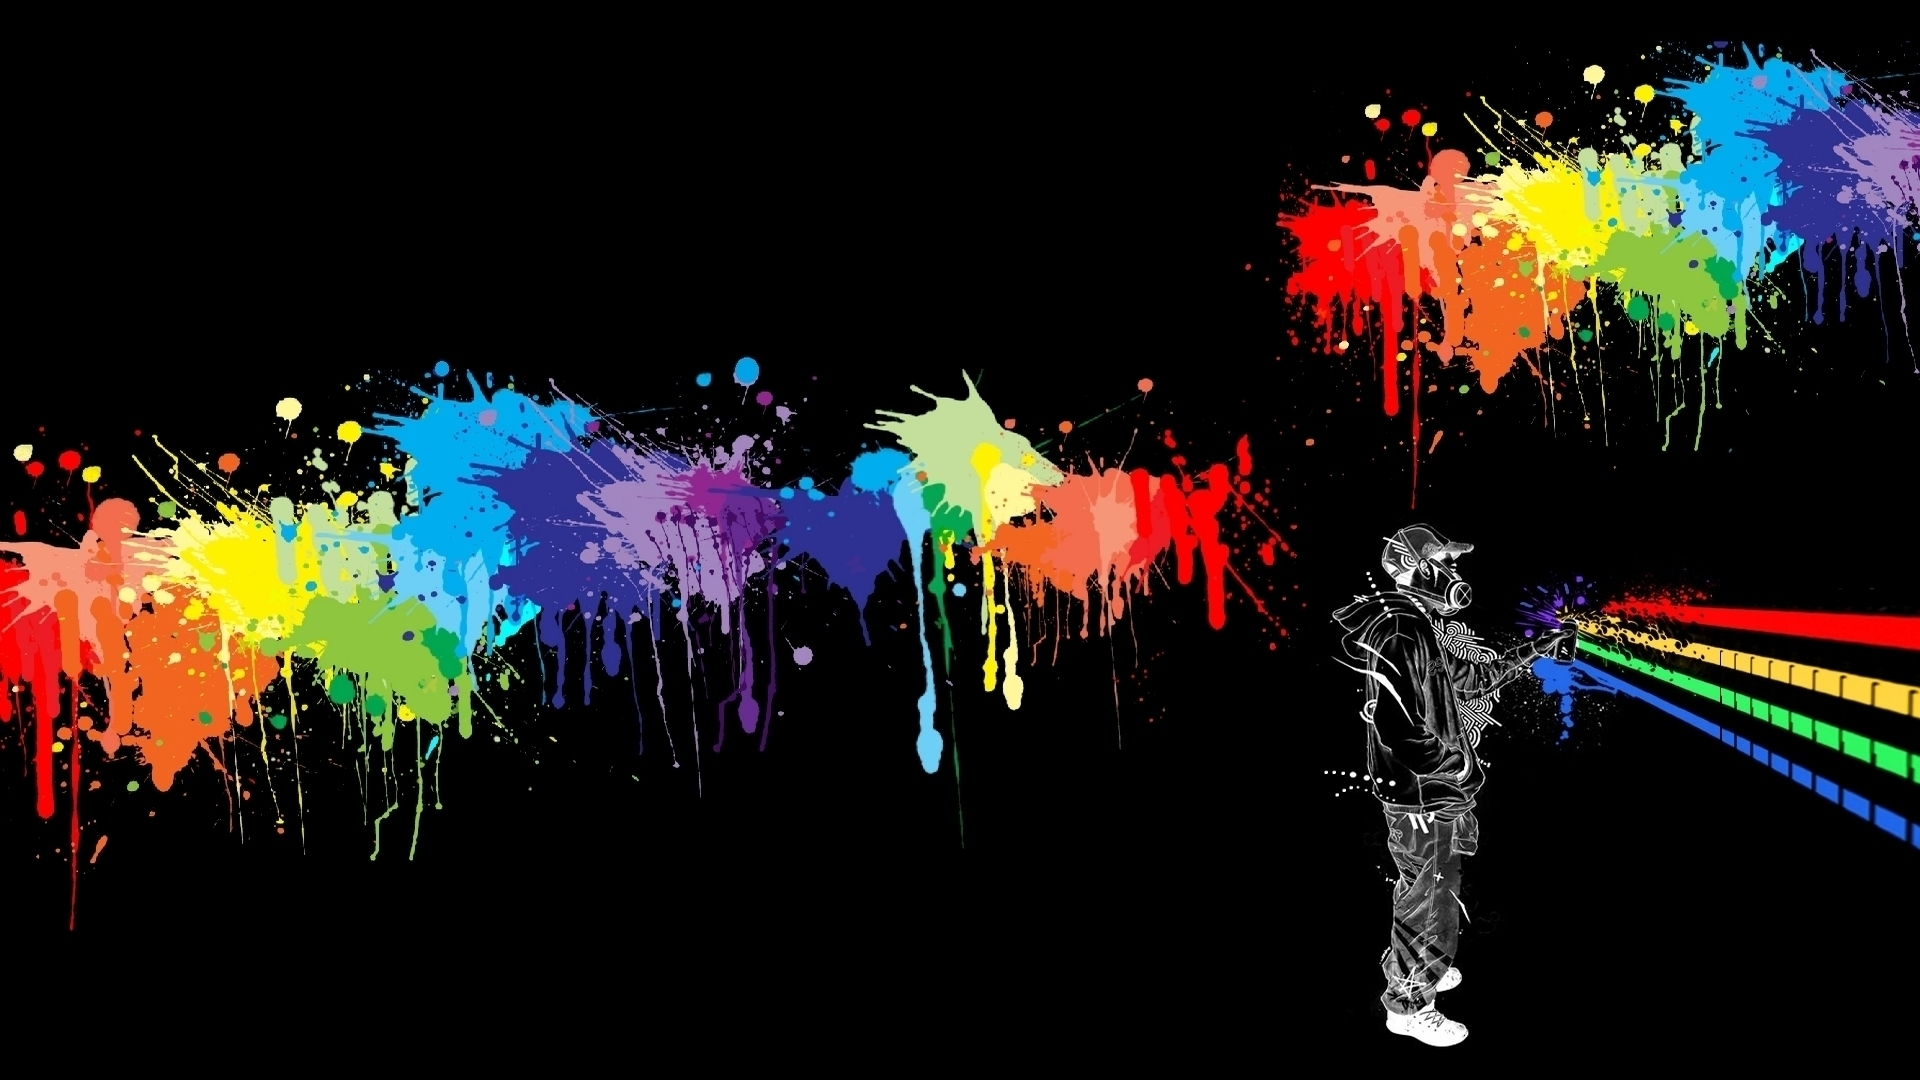 Cool Image